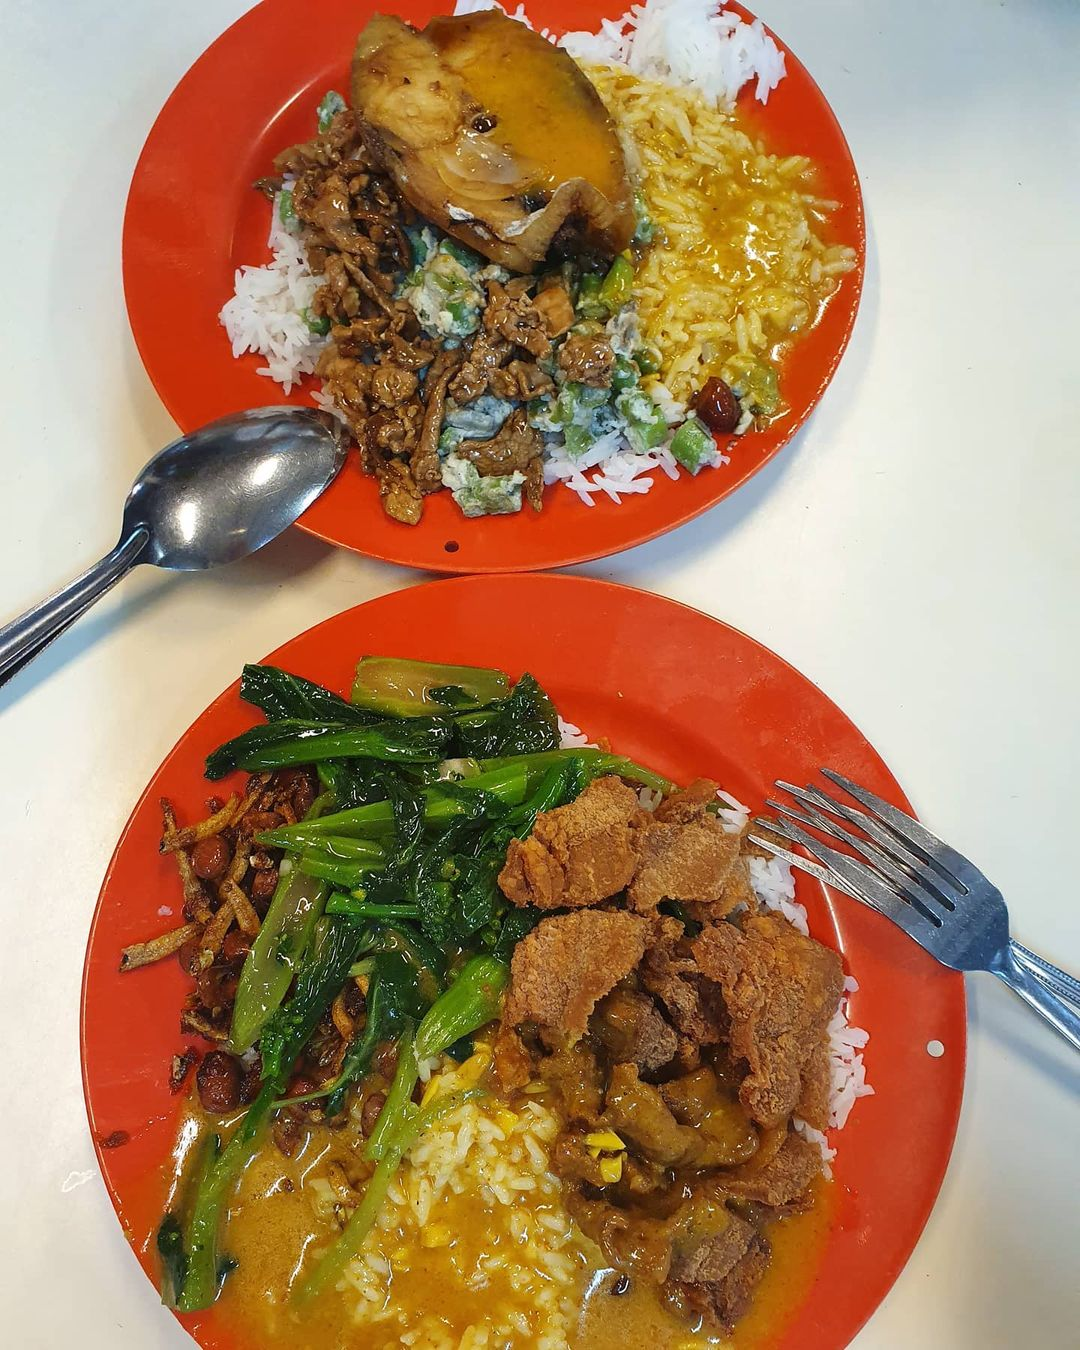 jing shu shi curry rice tanglin halt food centre